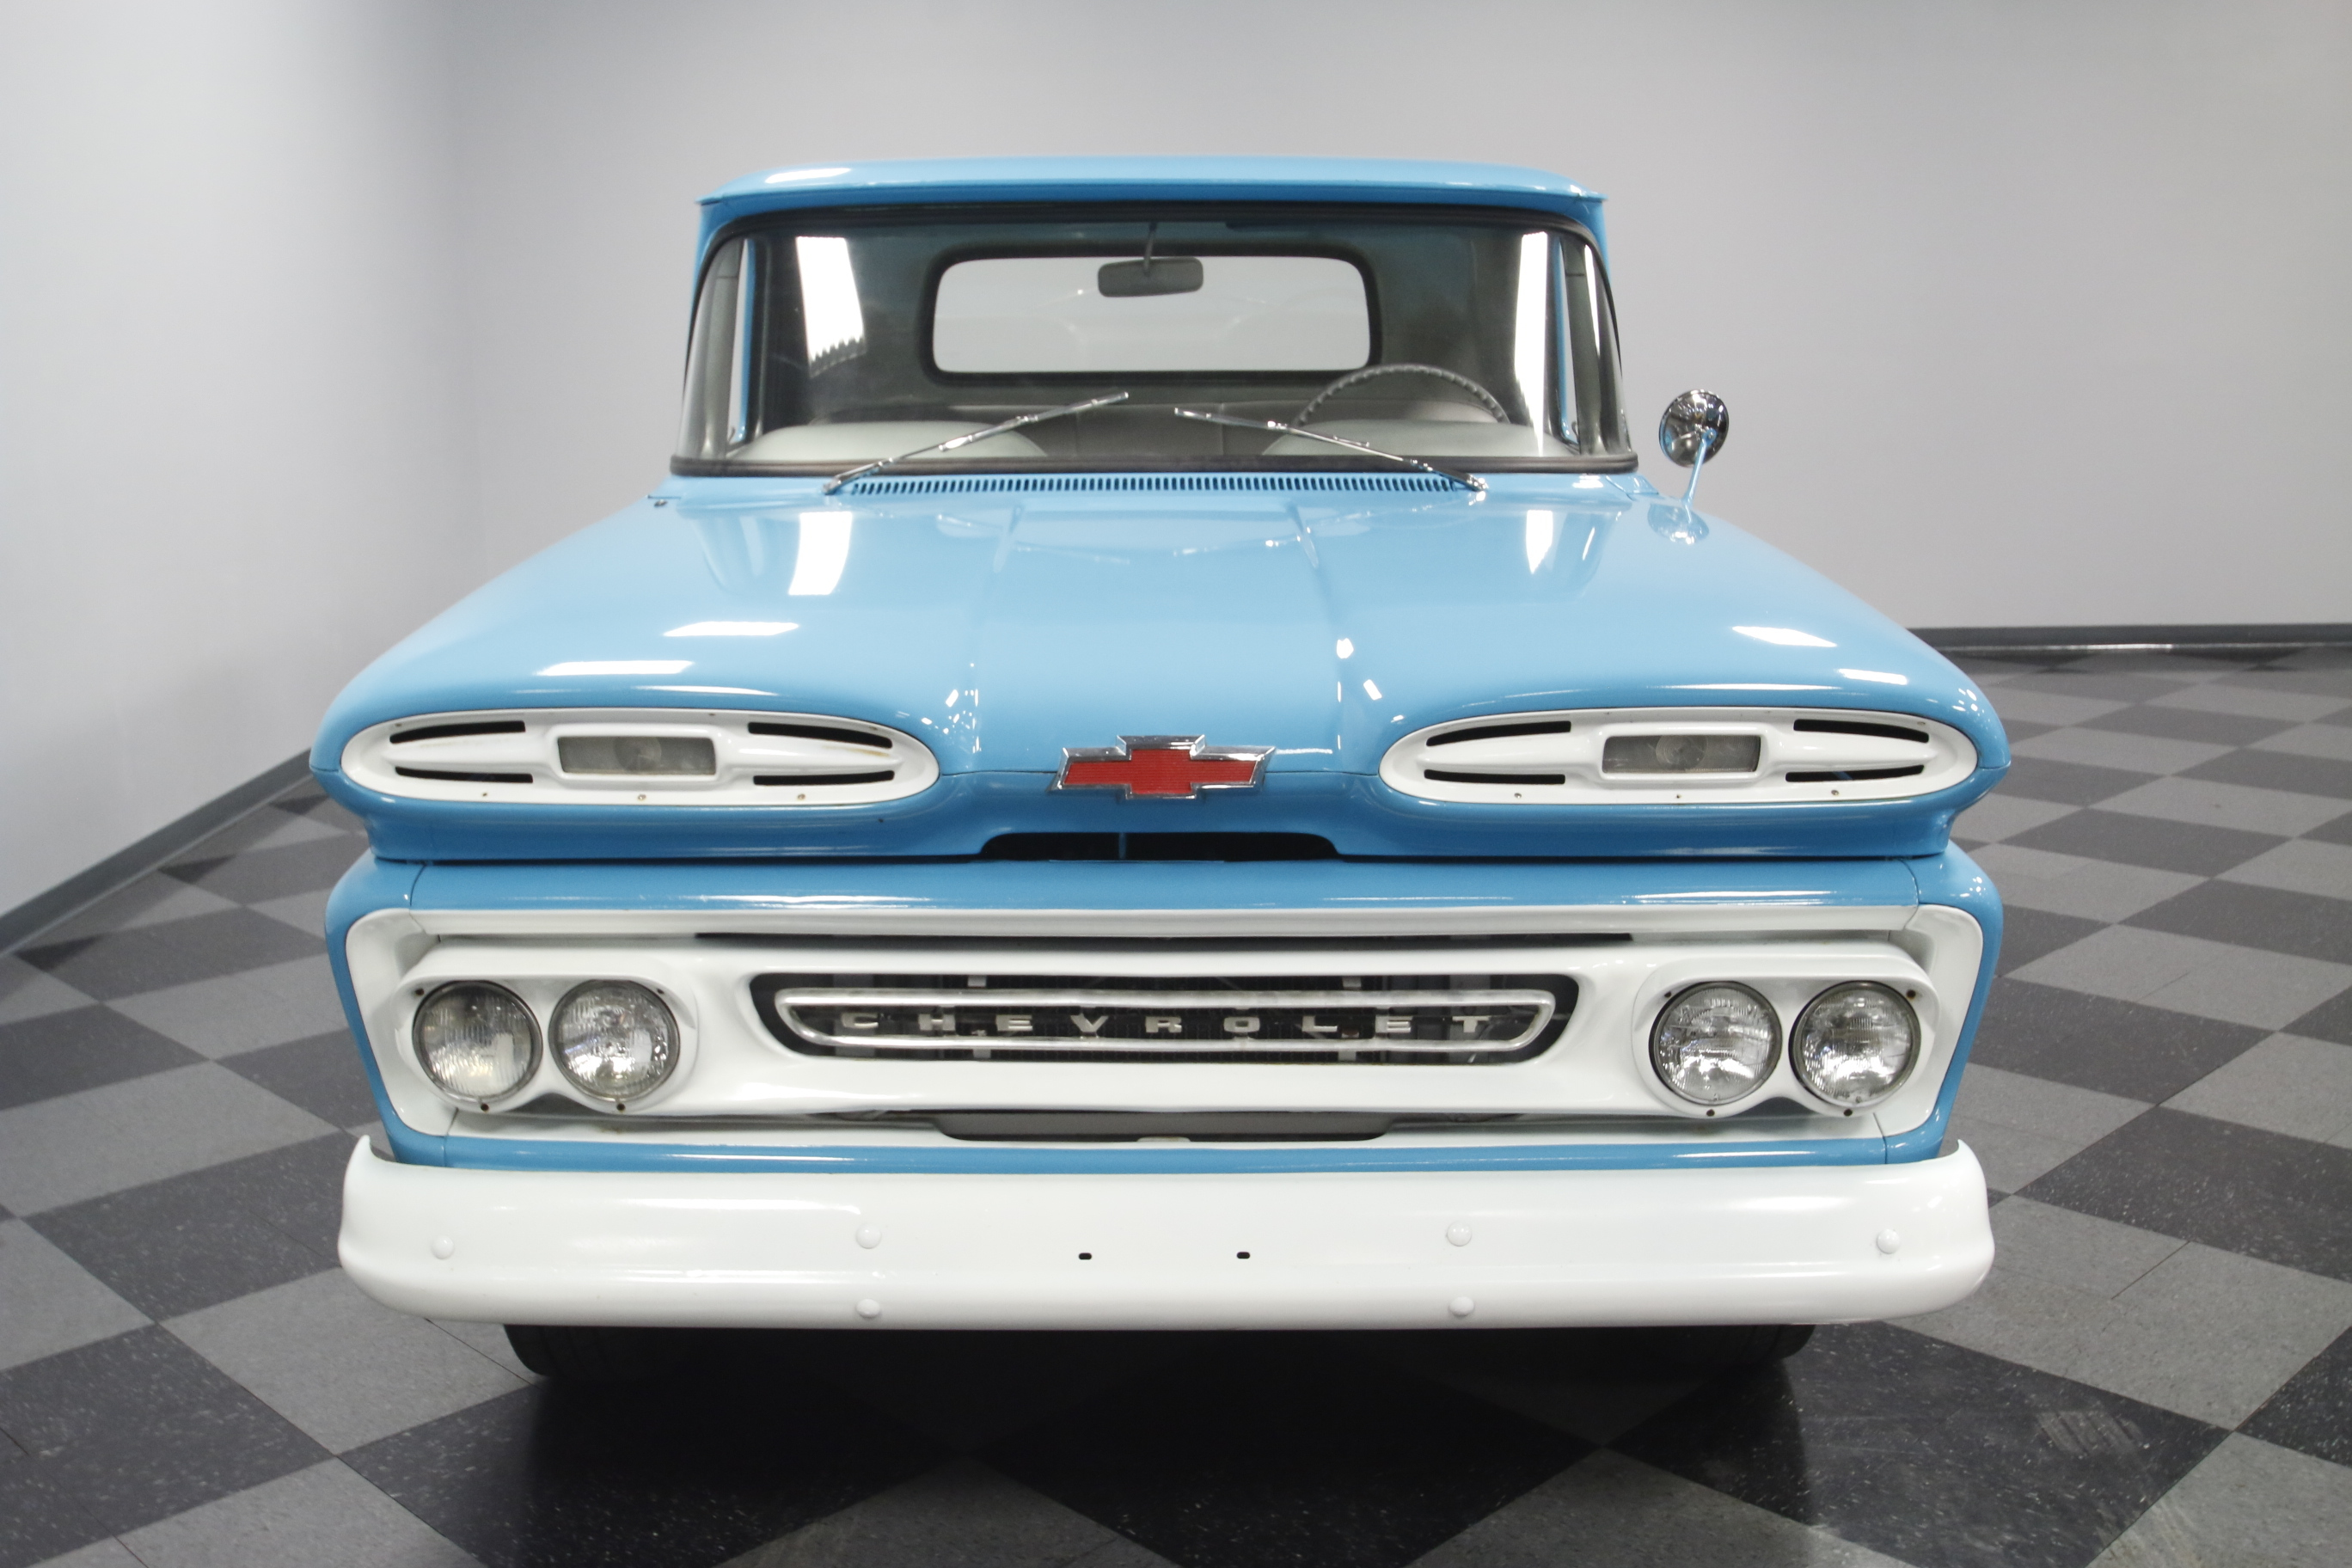 1961 Chevrolet Apache Ebay Pick Up 4548 Cha Streetside Classics